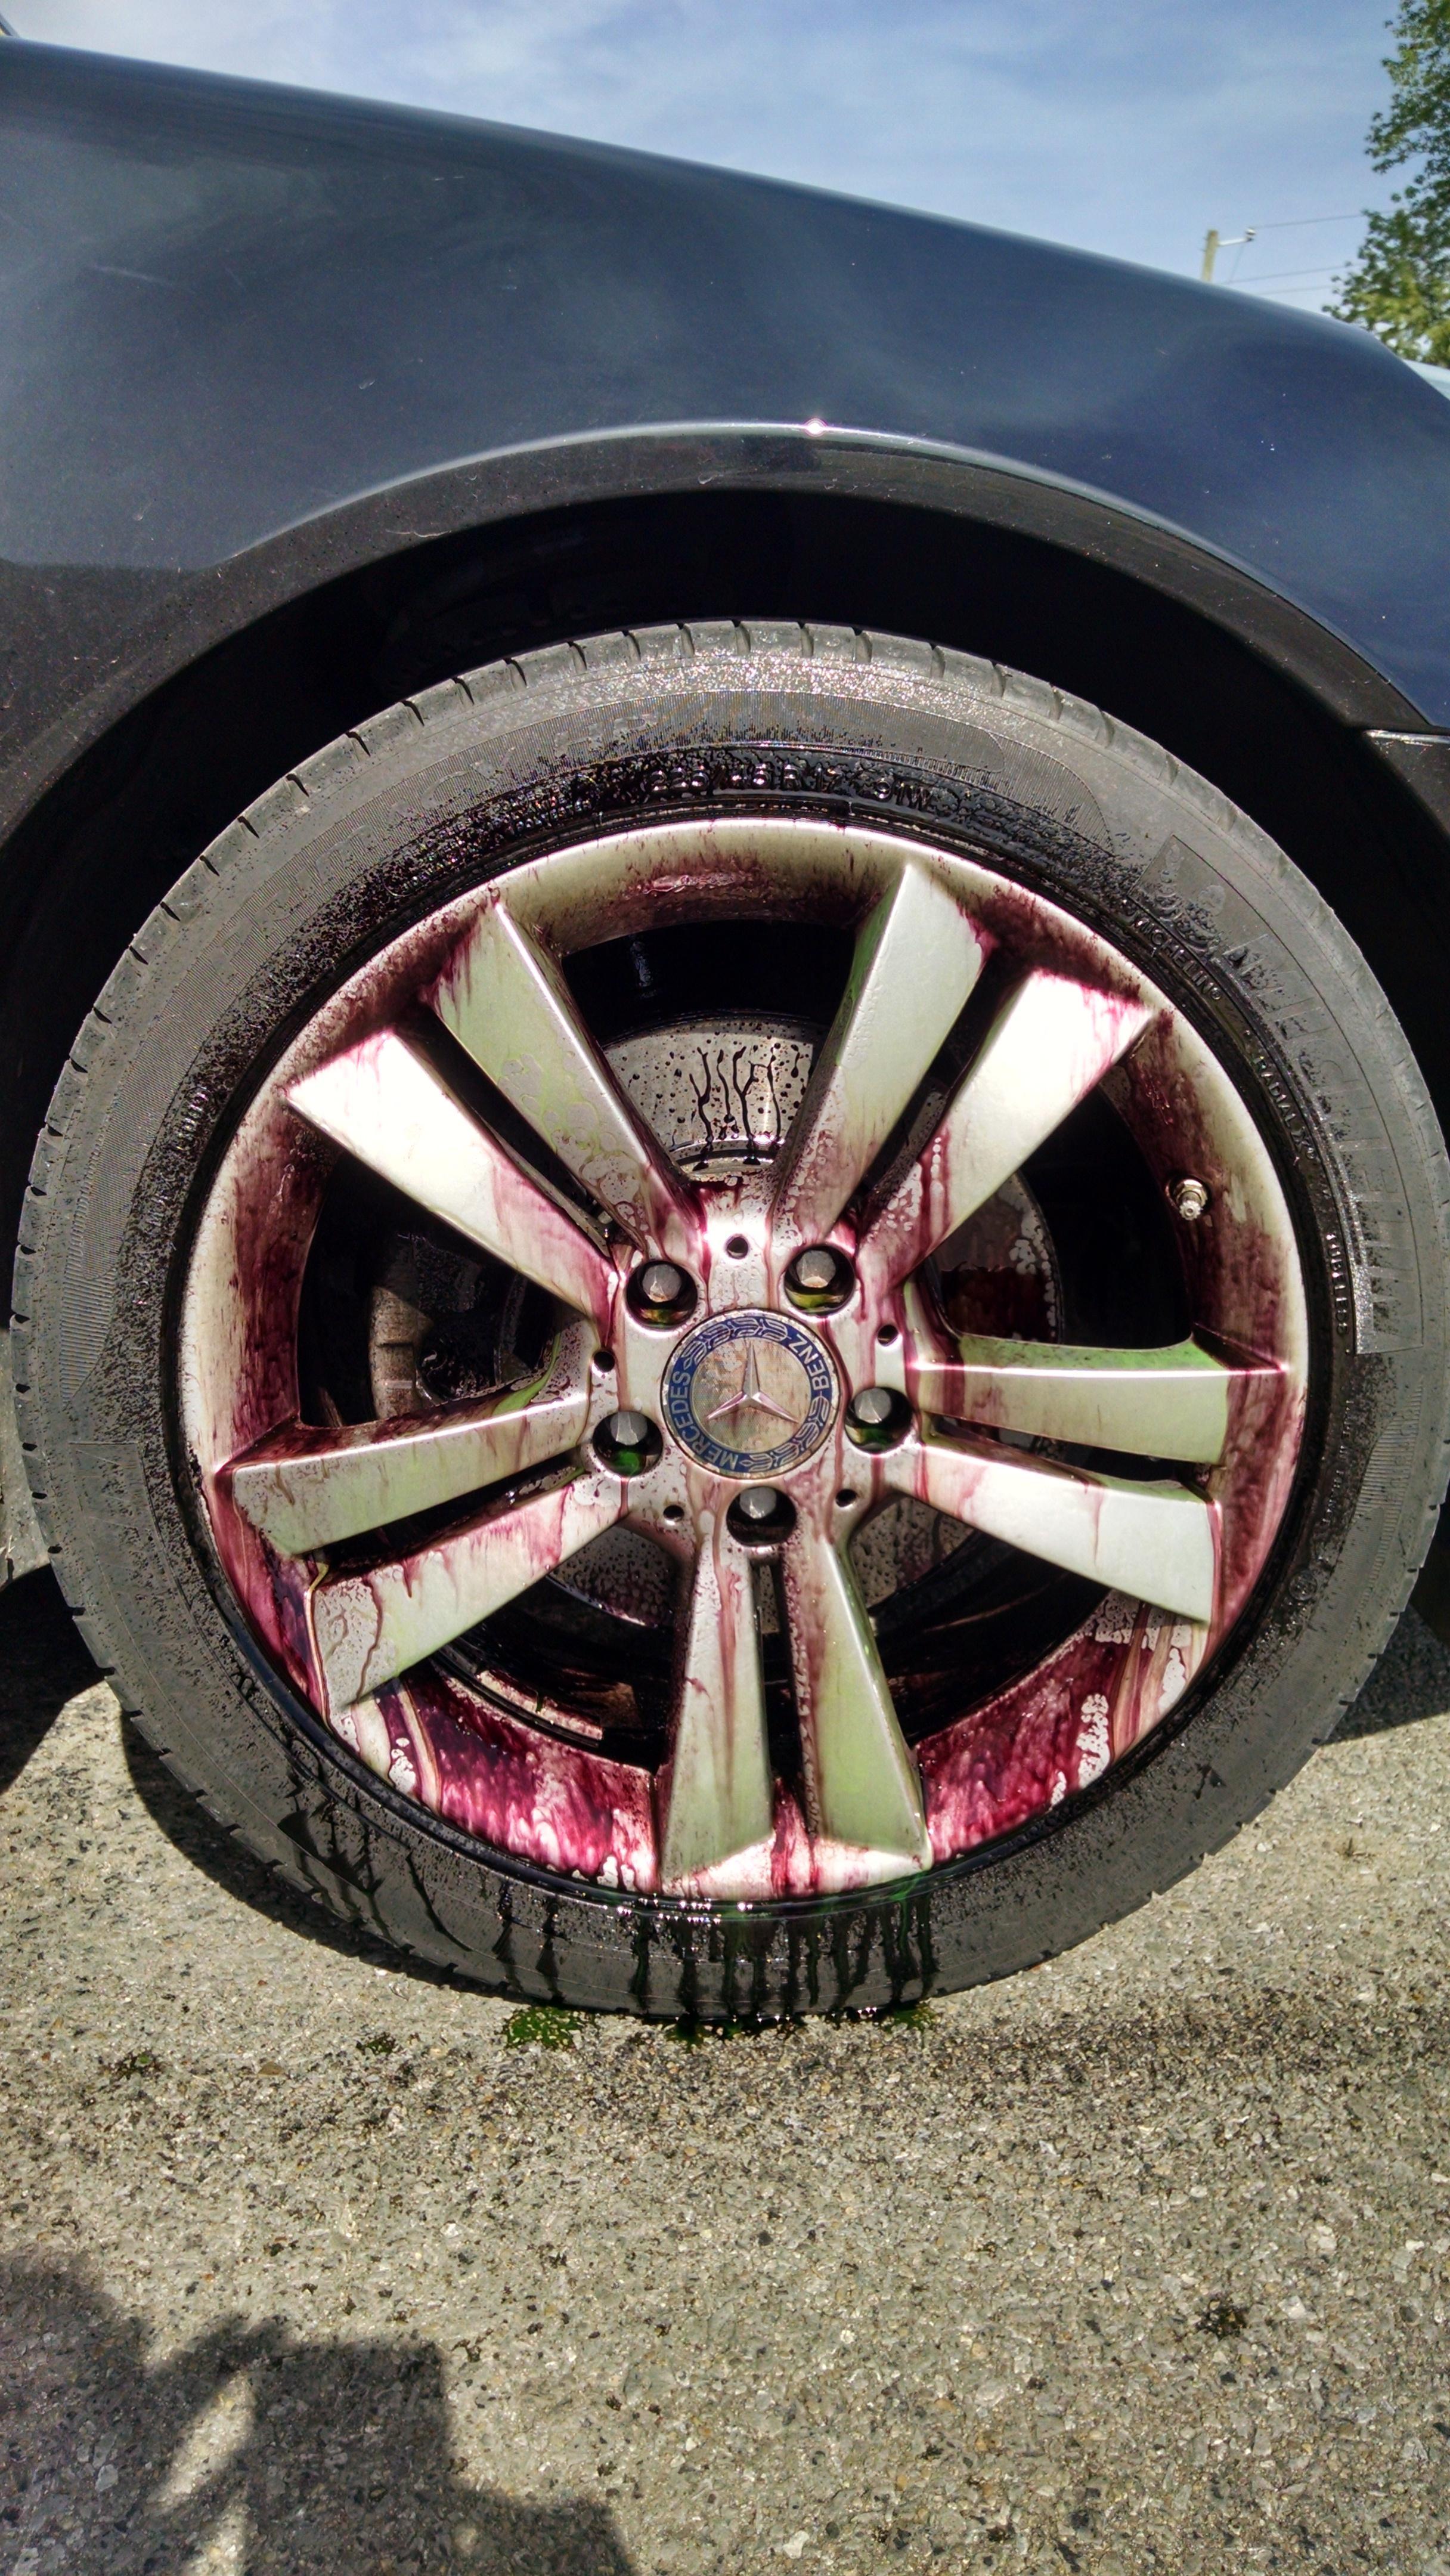 Amazon.com: Sonax (230500) Wheel Cleaner Full Effect Refill - 169 fl